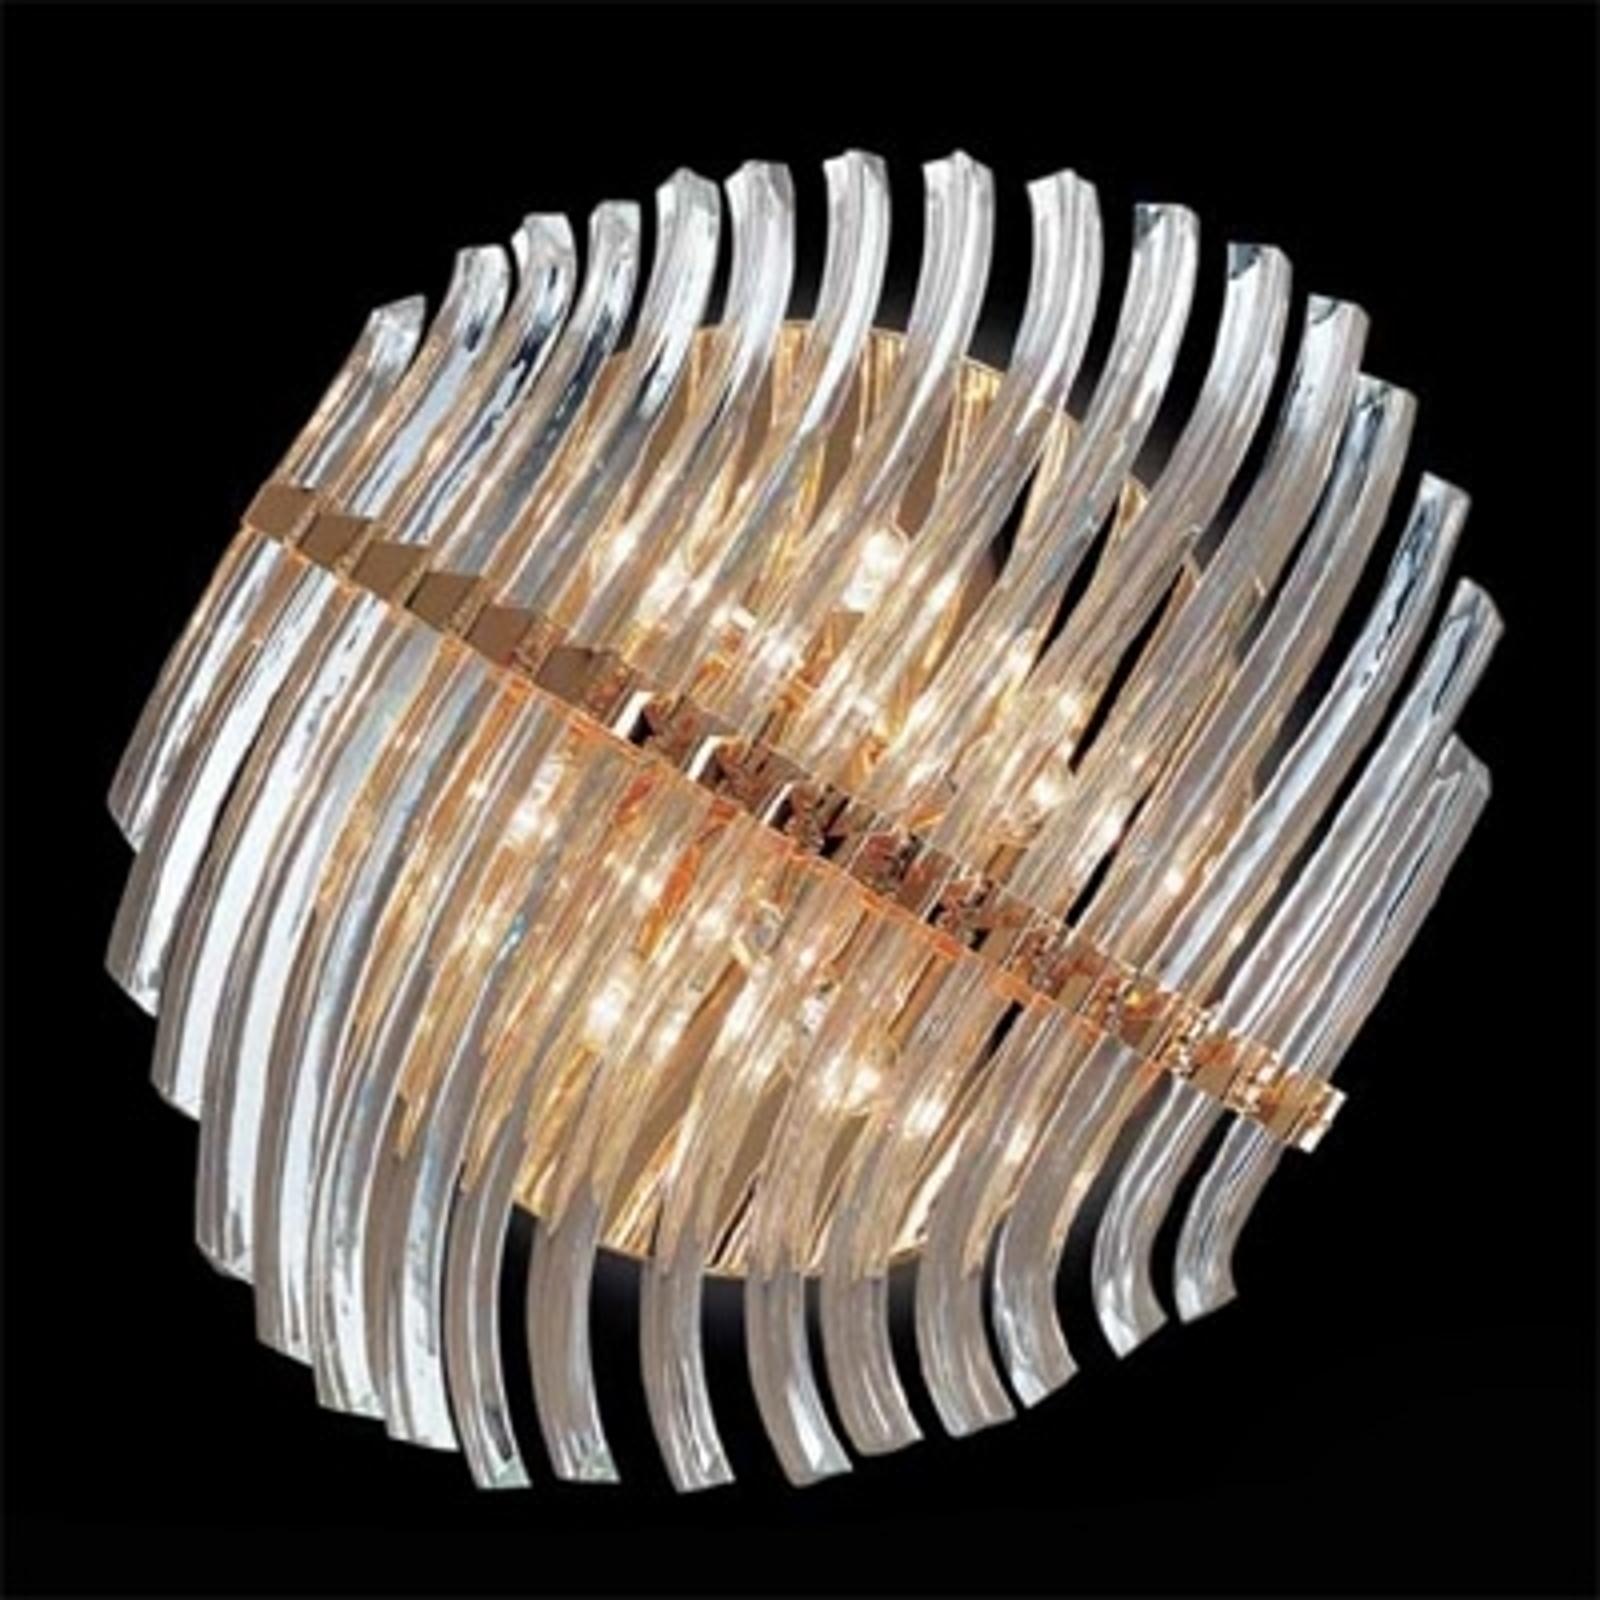 RONDO plafondlamp met chique effect